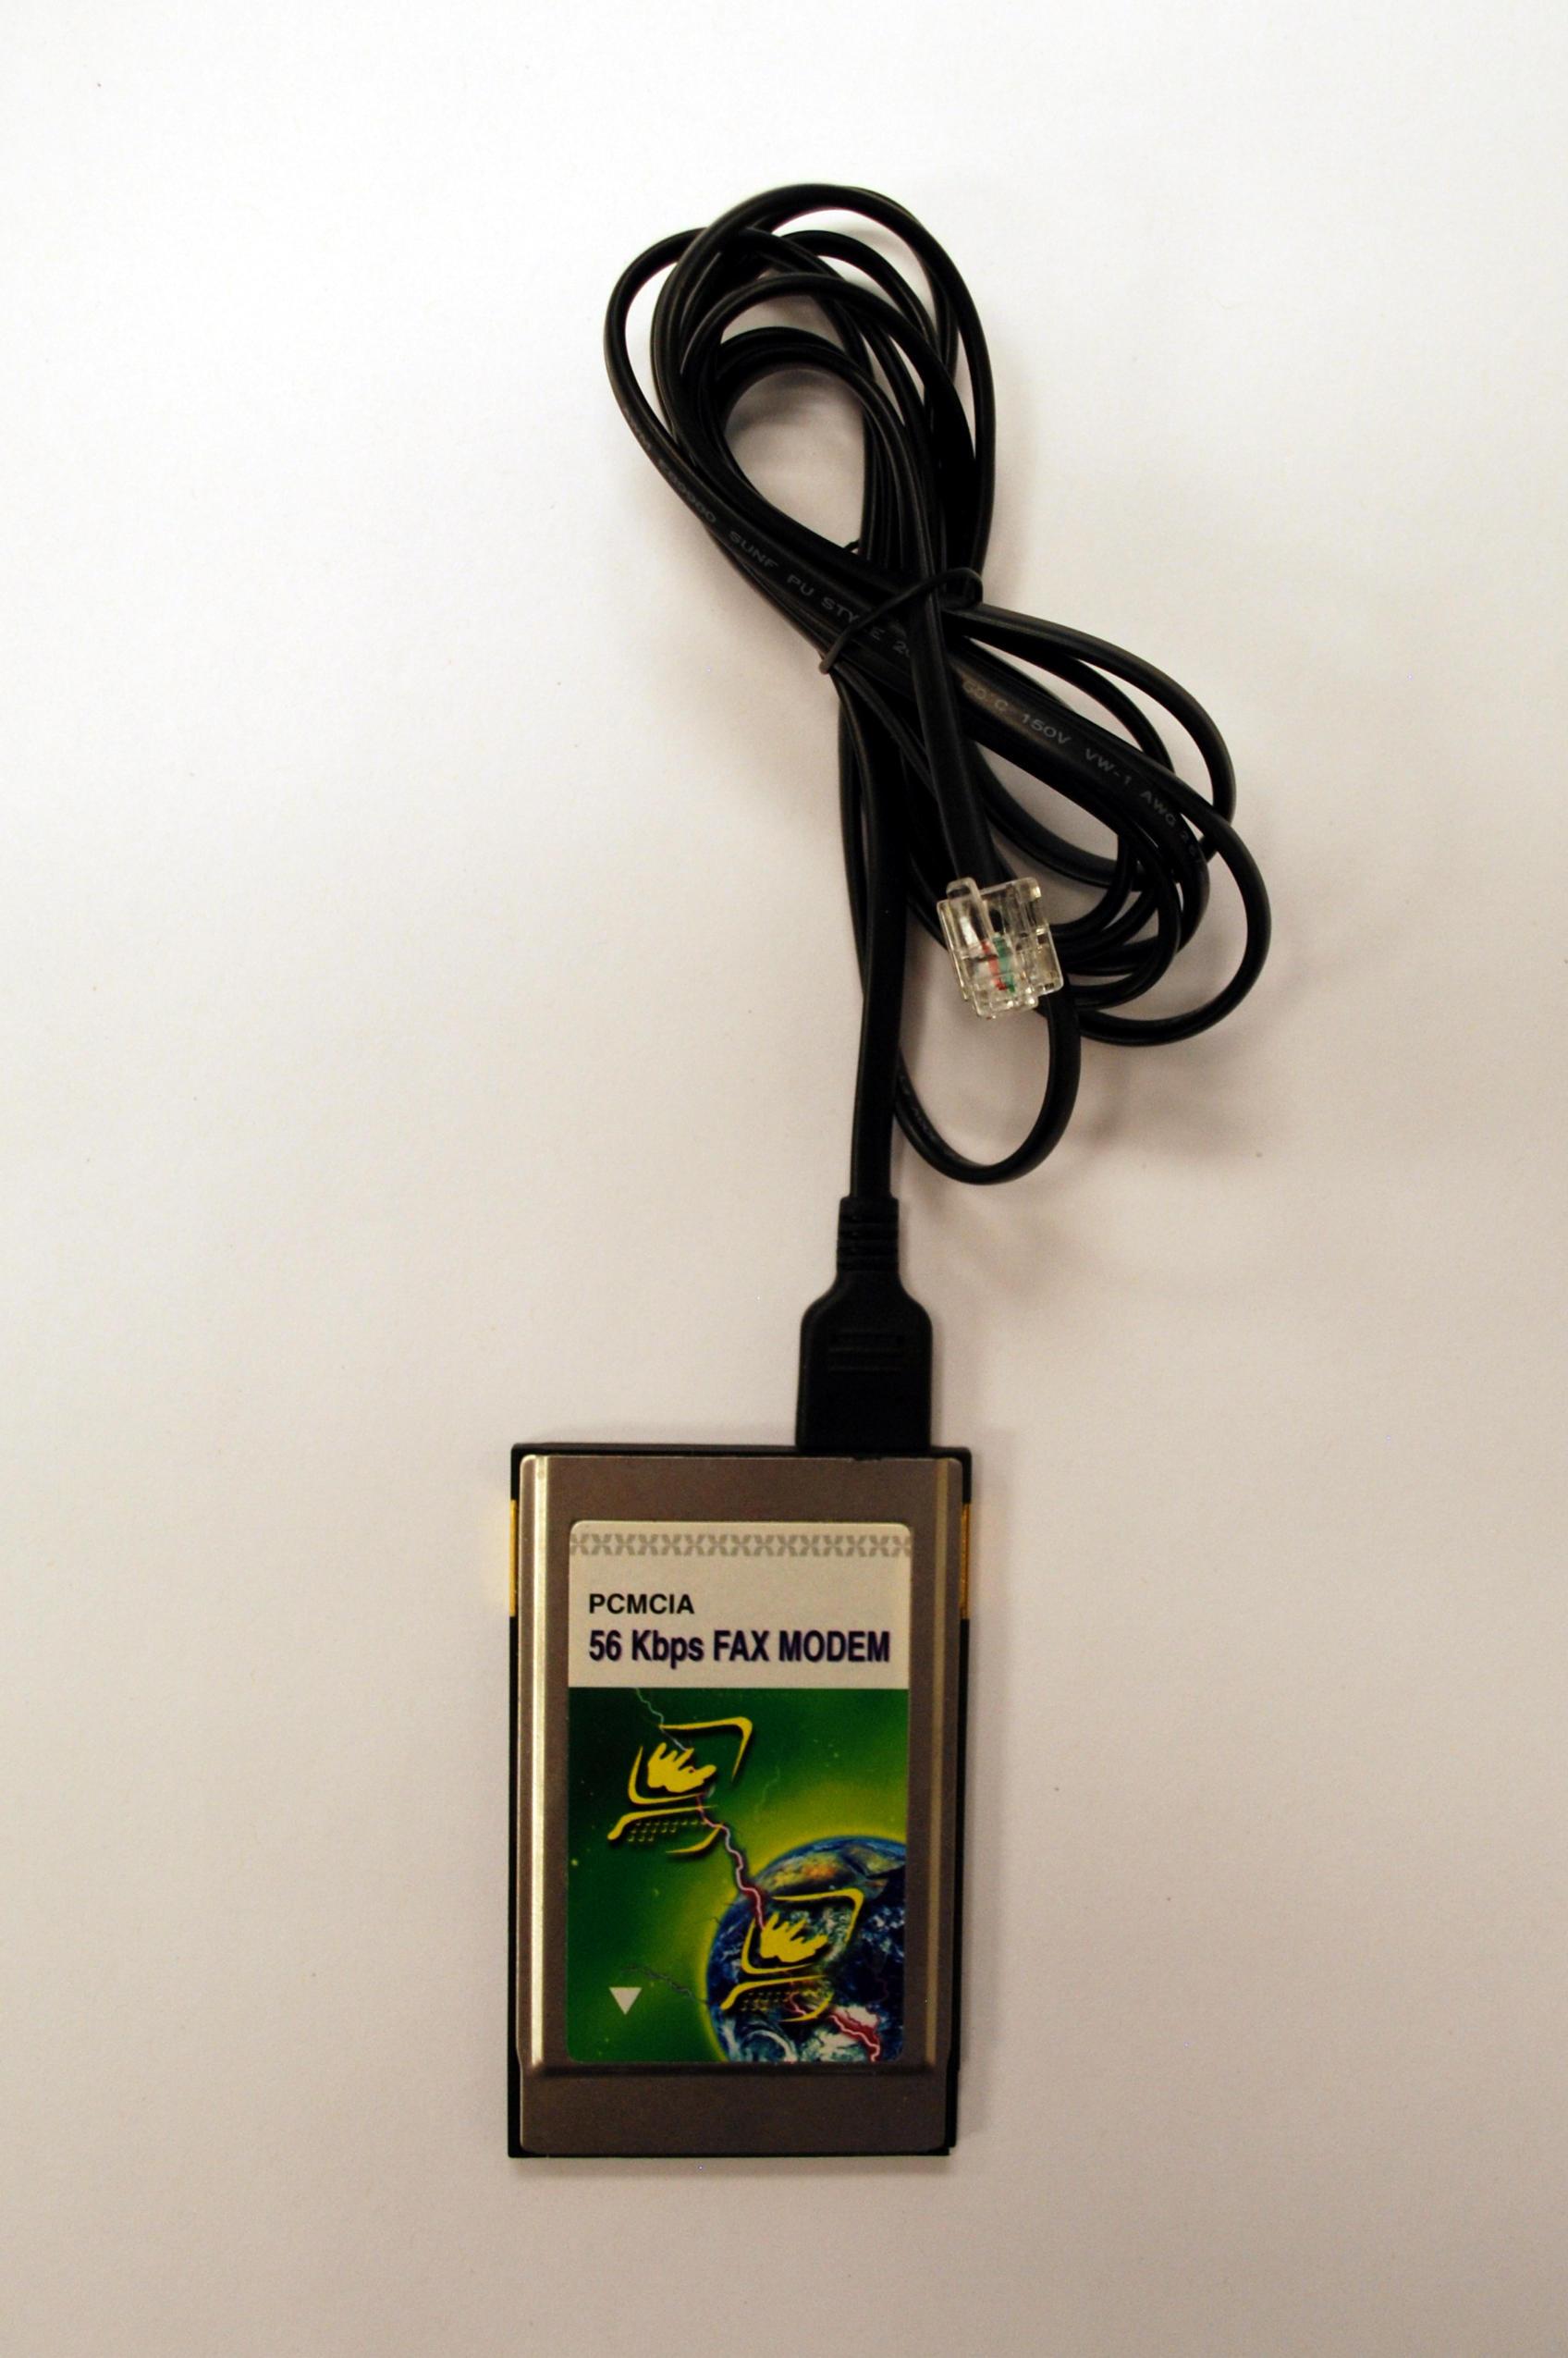 ASKEY VENUS PCMCIA MODEM DRIVERS FOR PC